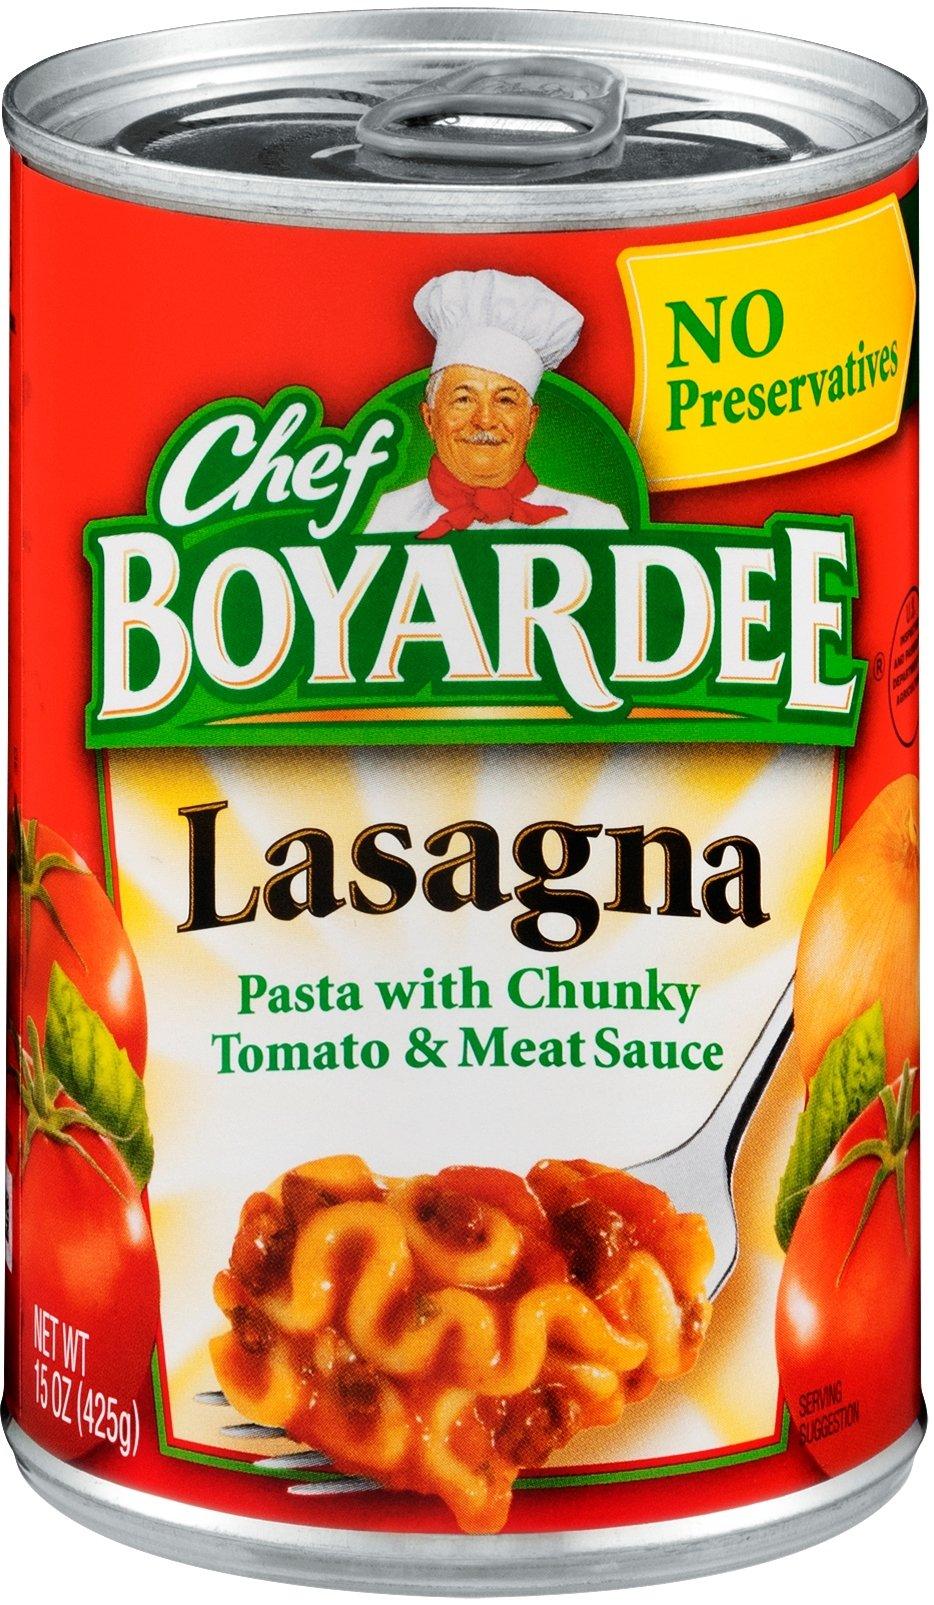 Chef Boyardee Lasagna, 15 oz Can (Pack of 16)